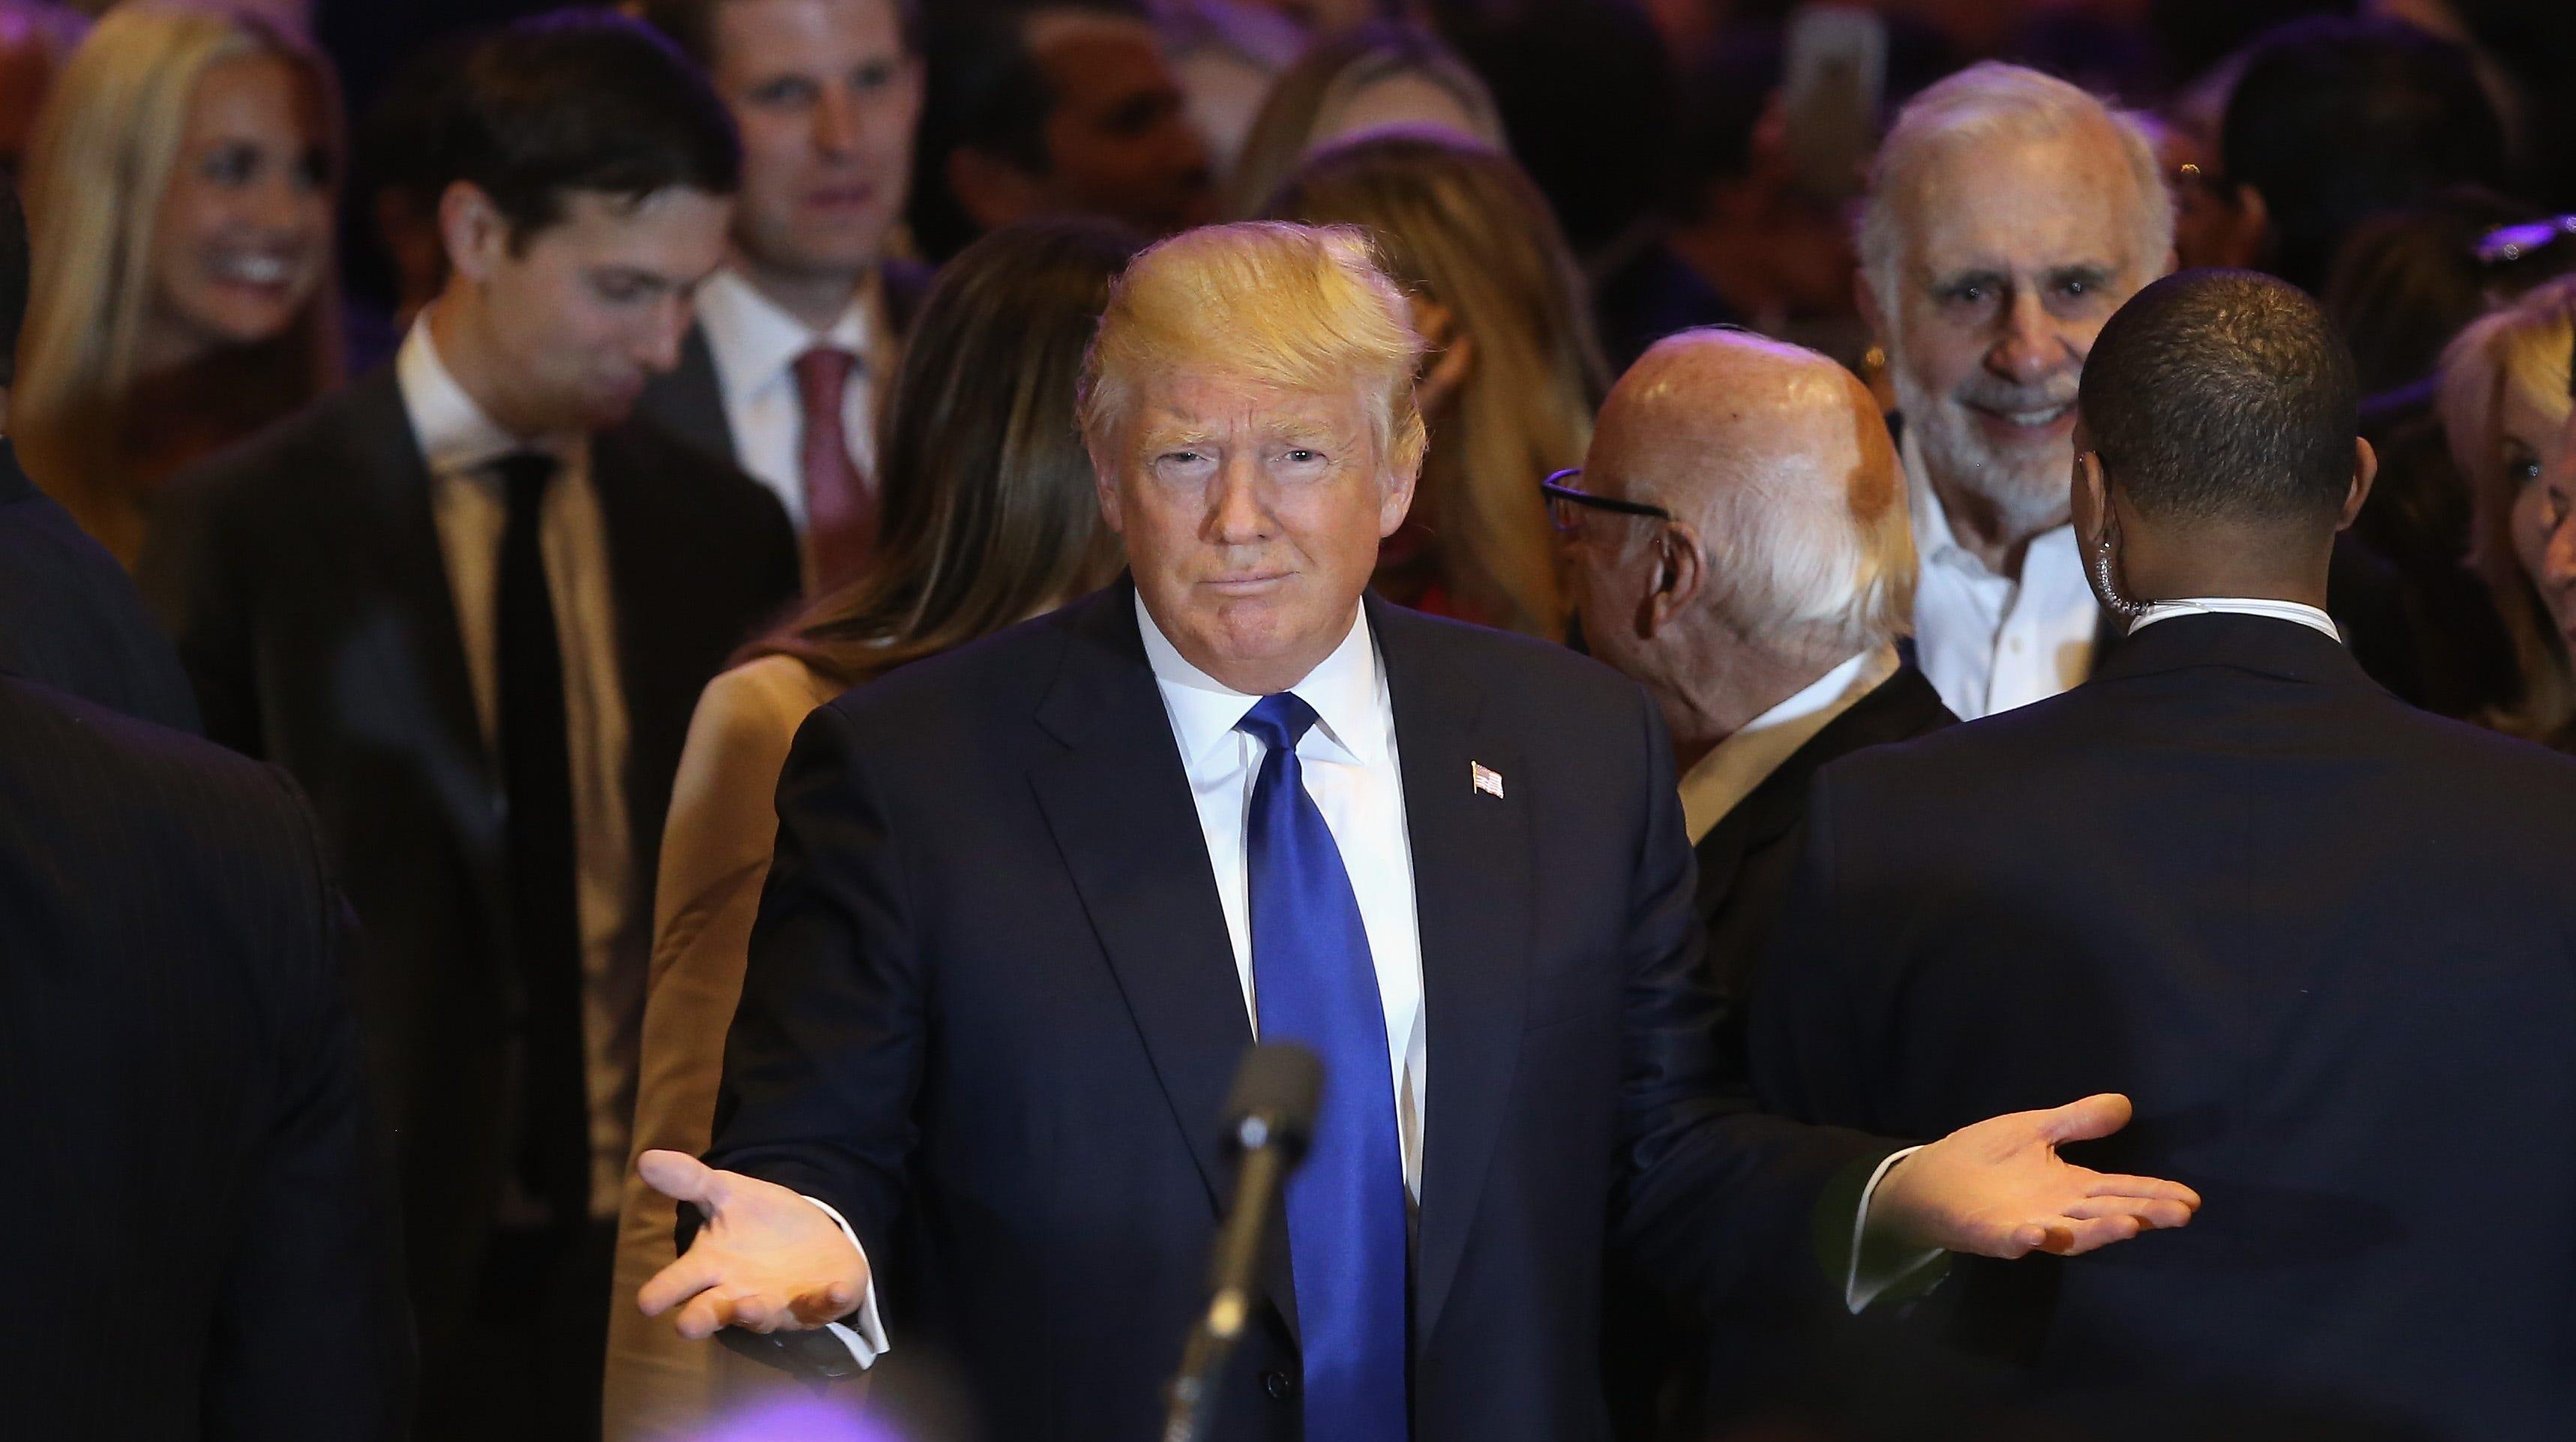 President Donald Trump